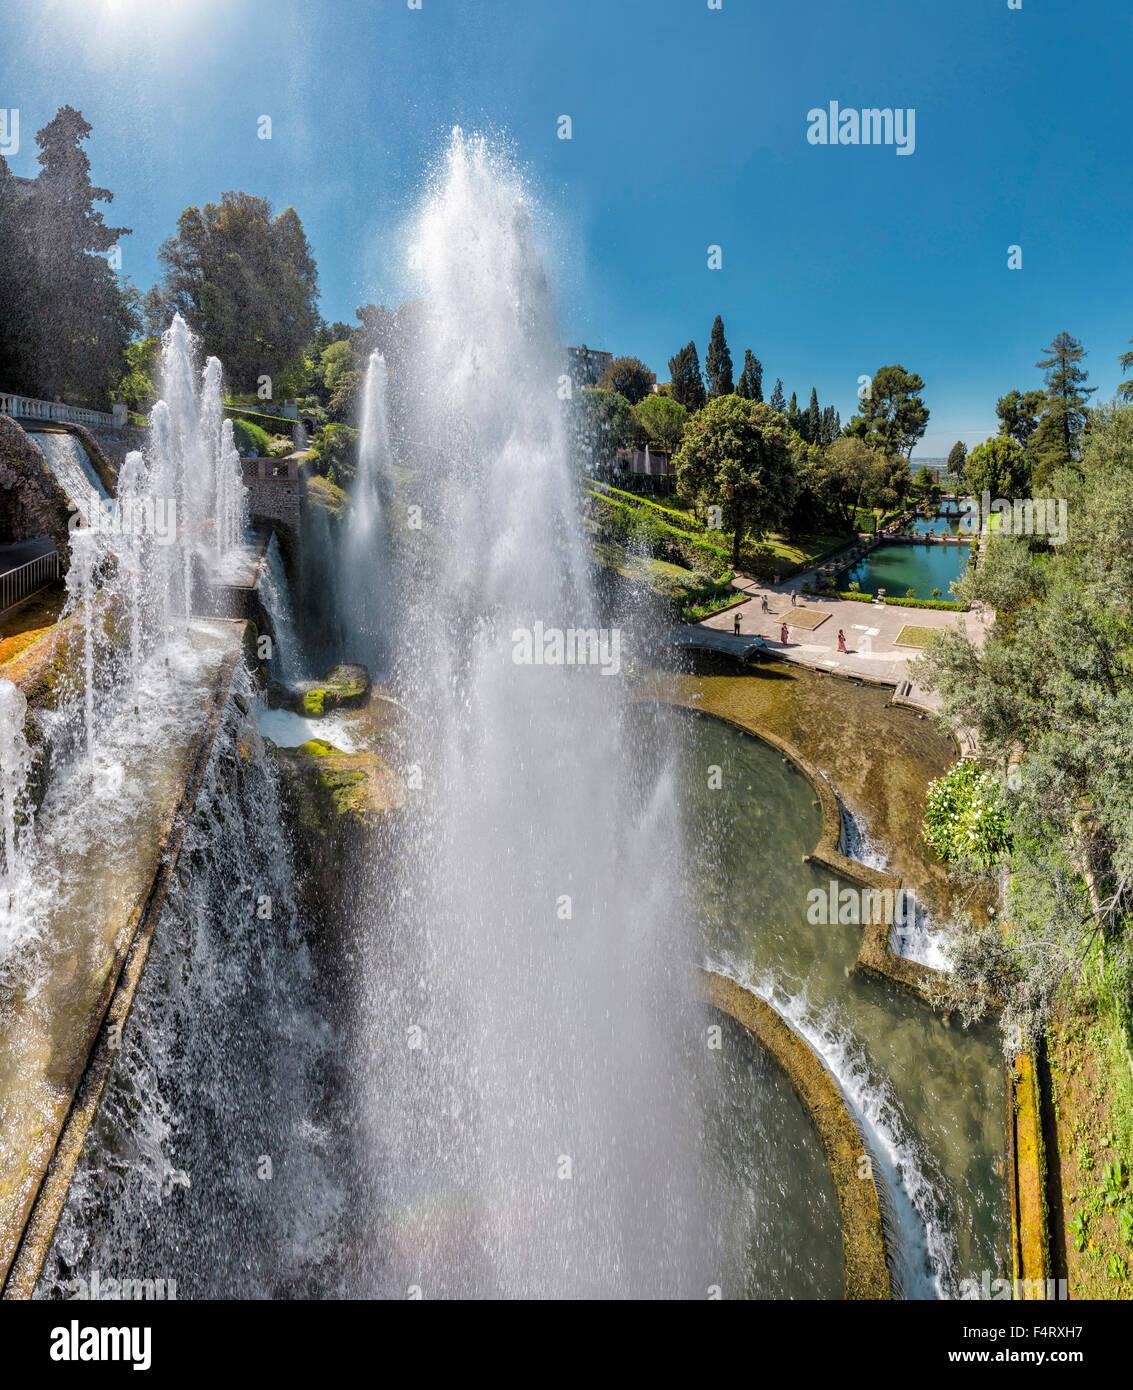 Italy, Europe, Tivoli, Lazio, Villa d'Este, garden, ponds ...